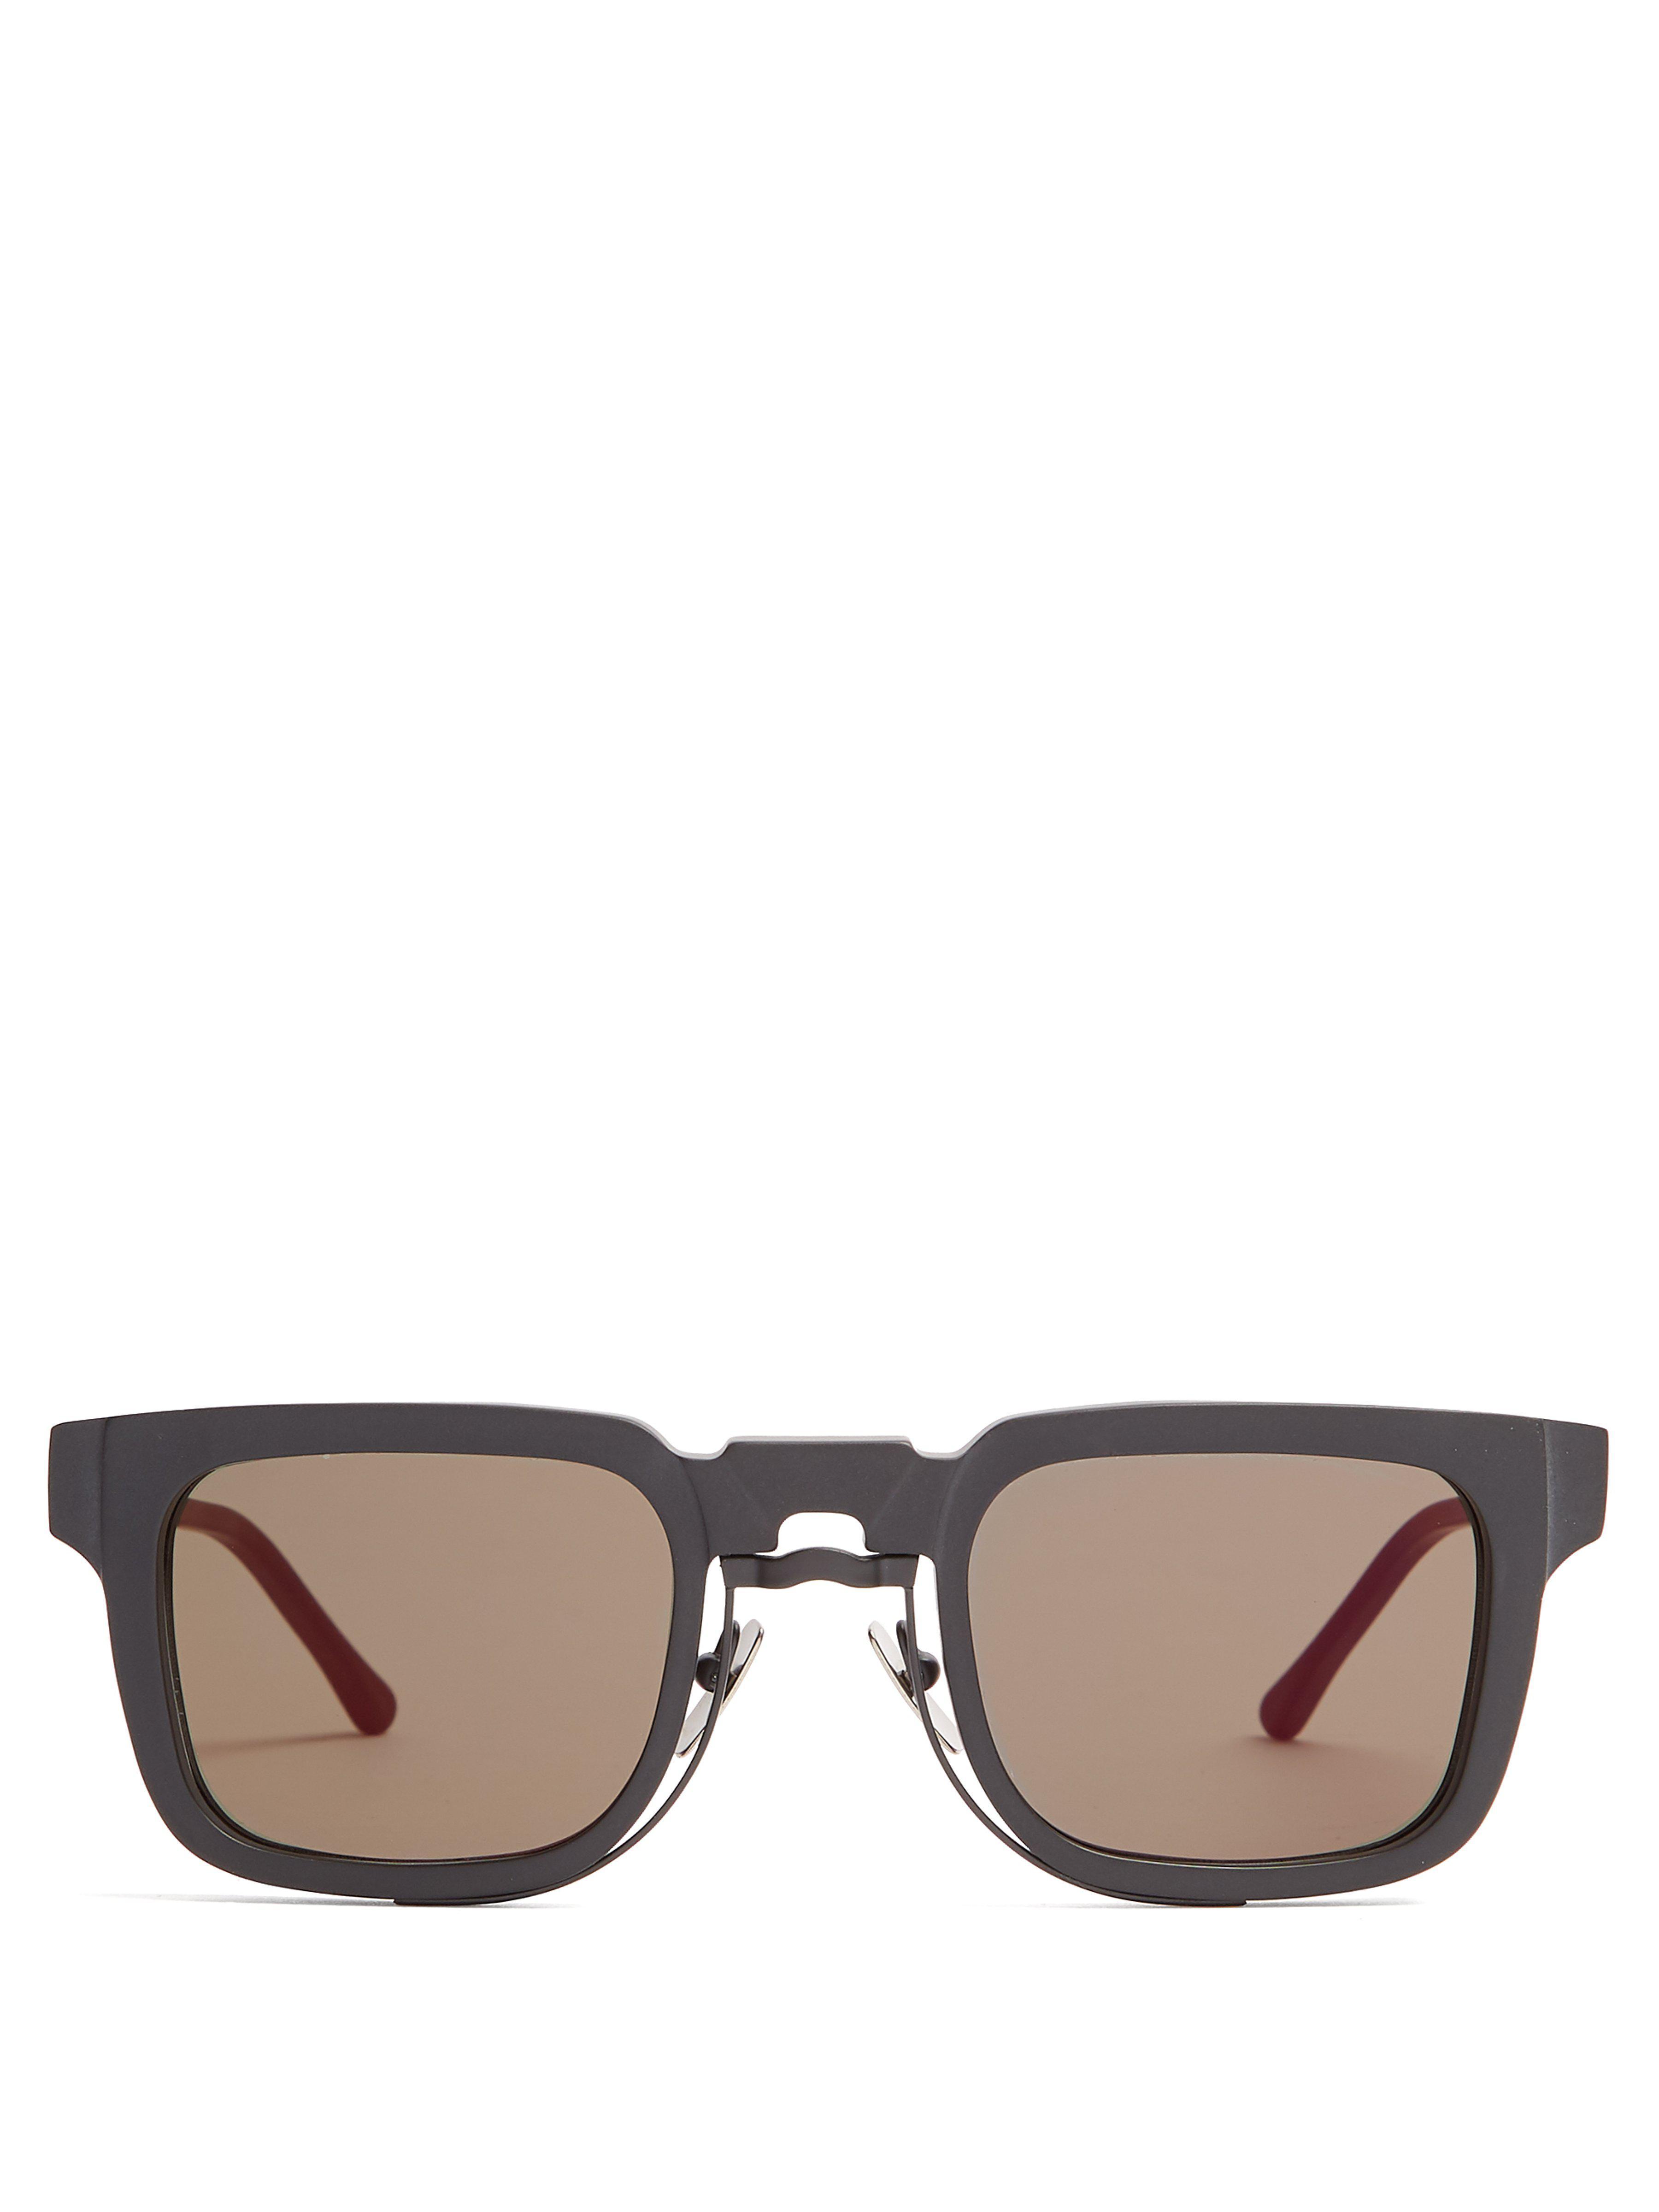 cdf94e337f42 Kuboraum Square Frame Acetate Sunglasses in Black for Men - Lyst